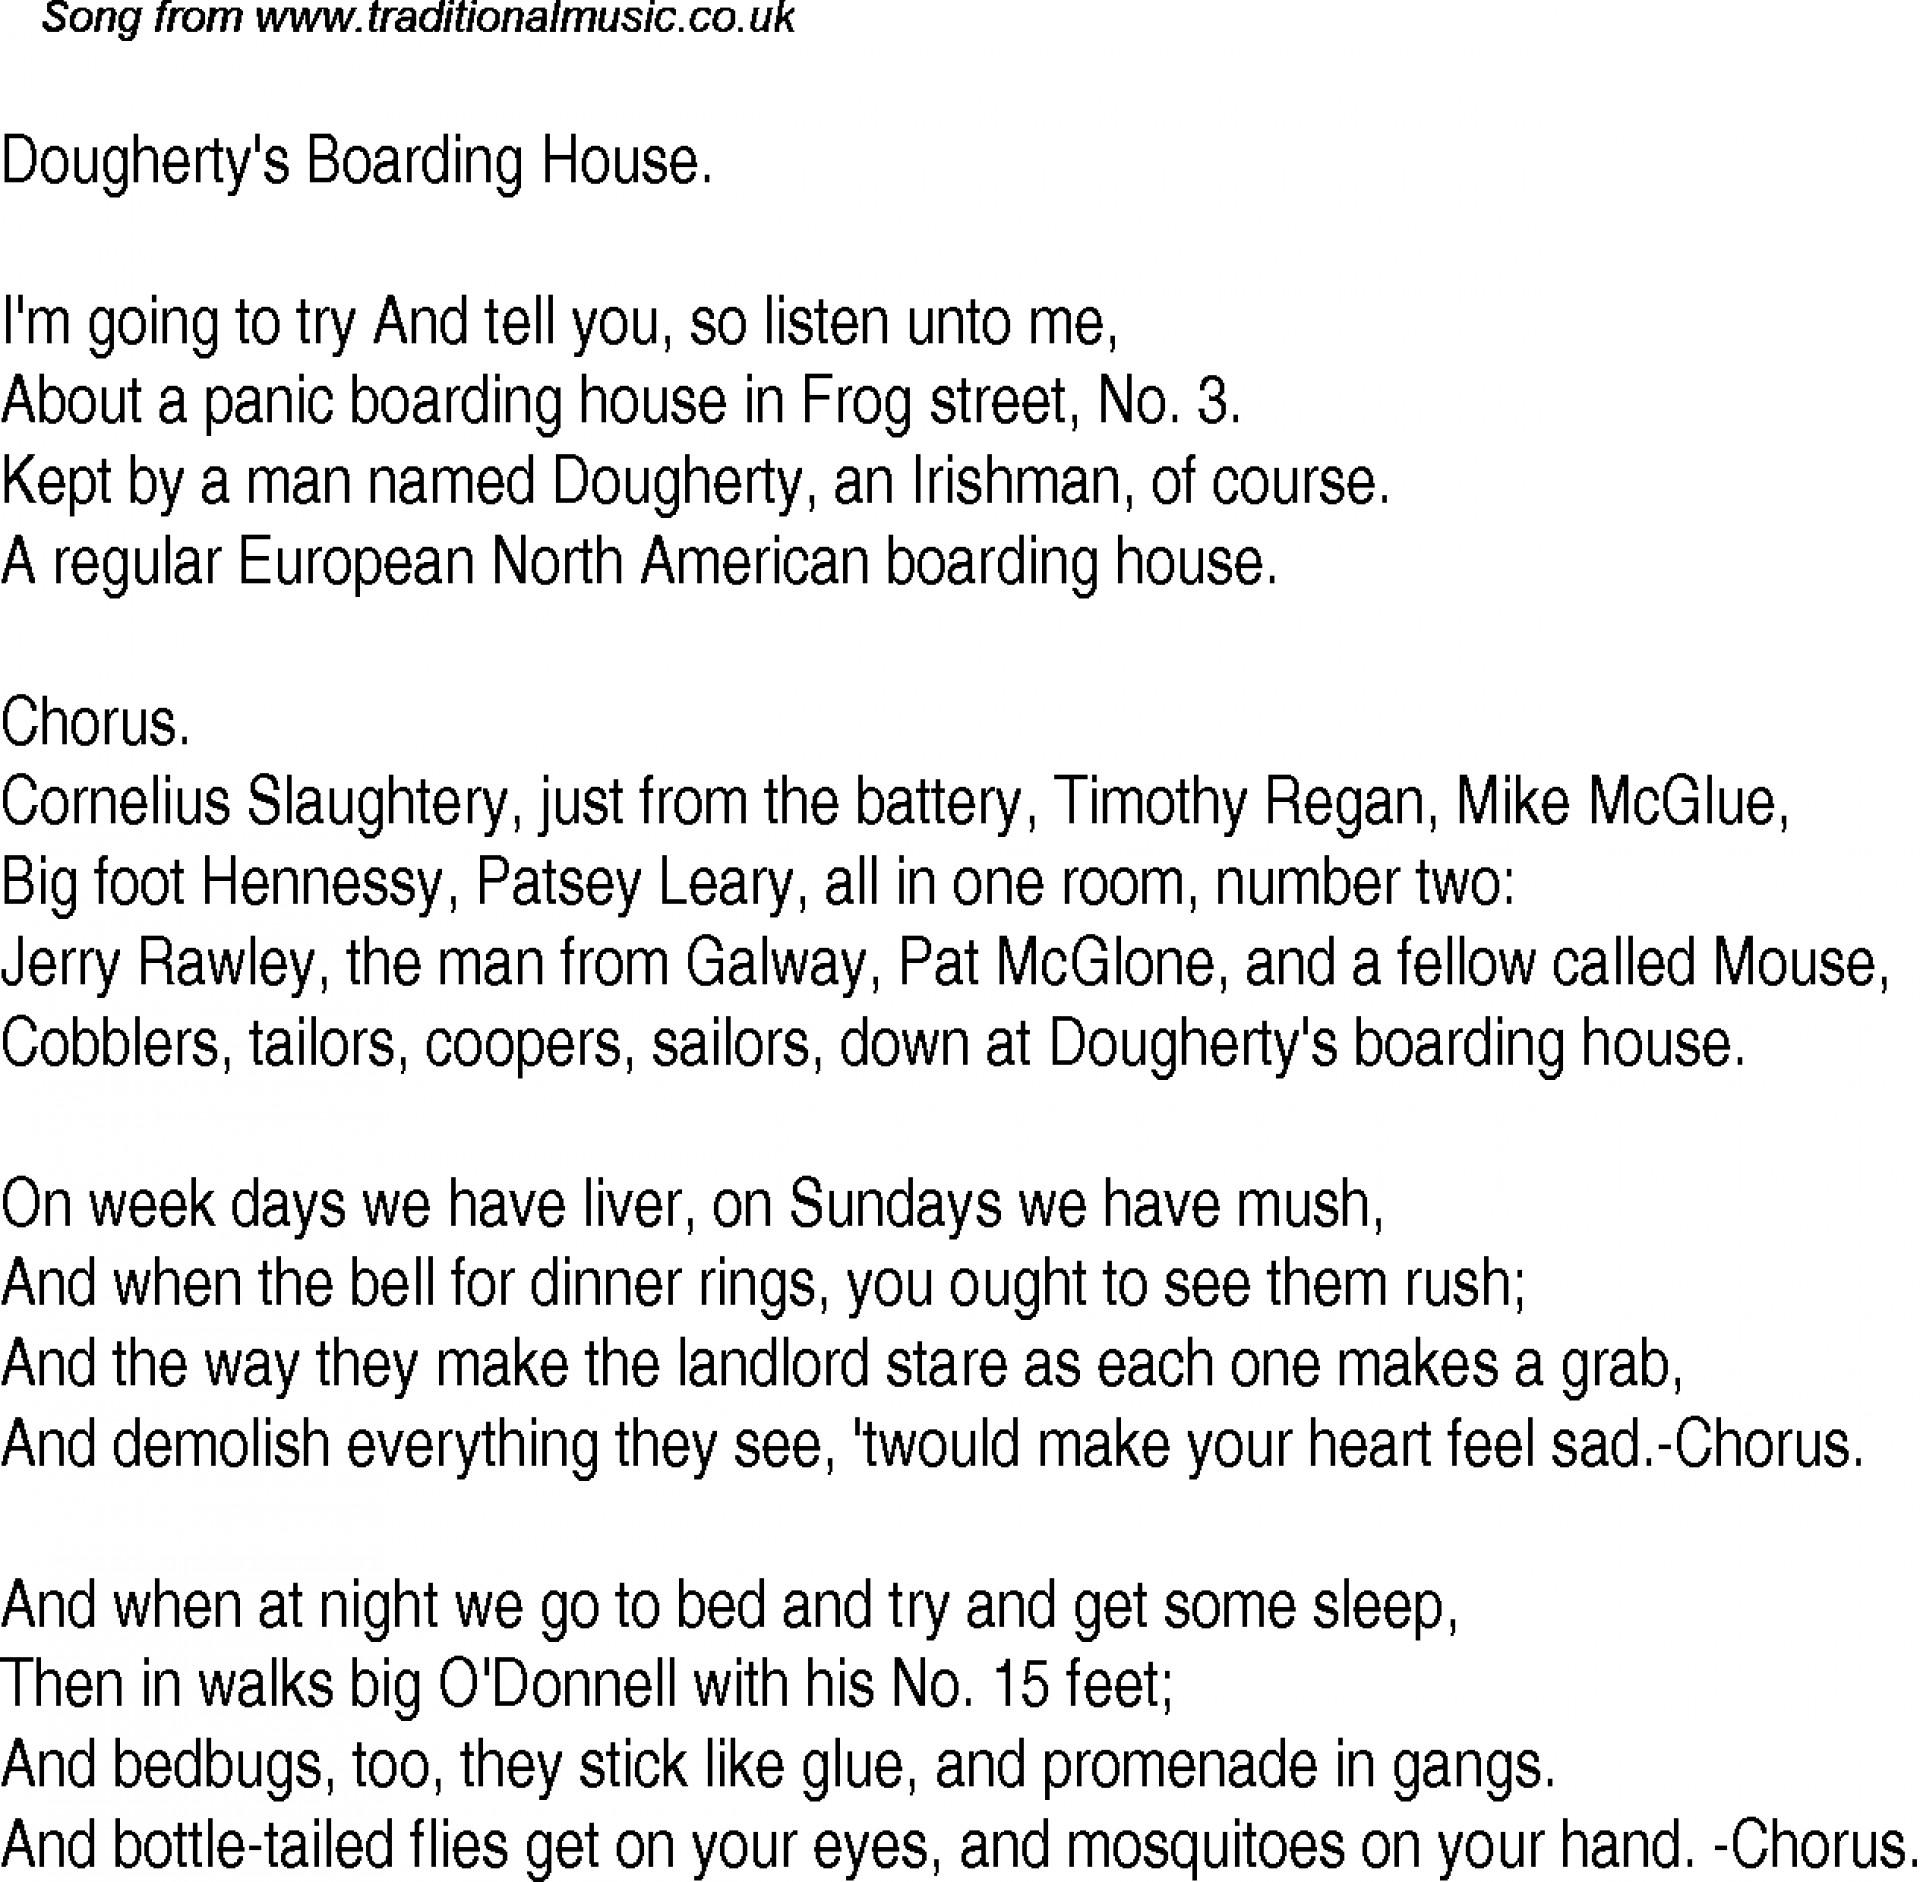 002 Essay Example Doughertys Boarding House Unsung Fantastic Heroes Of India Hero Intro My Mom 1920